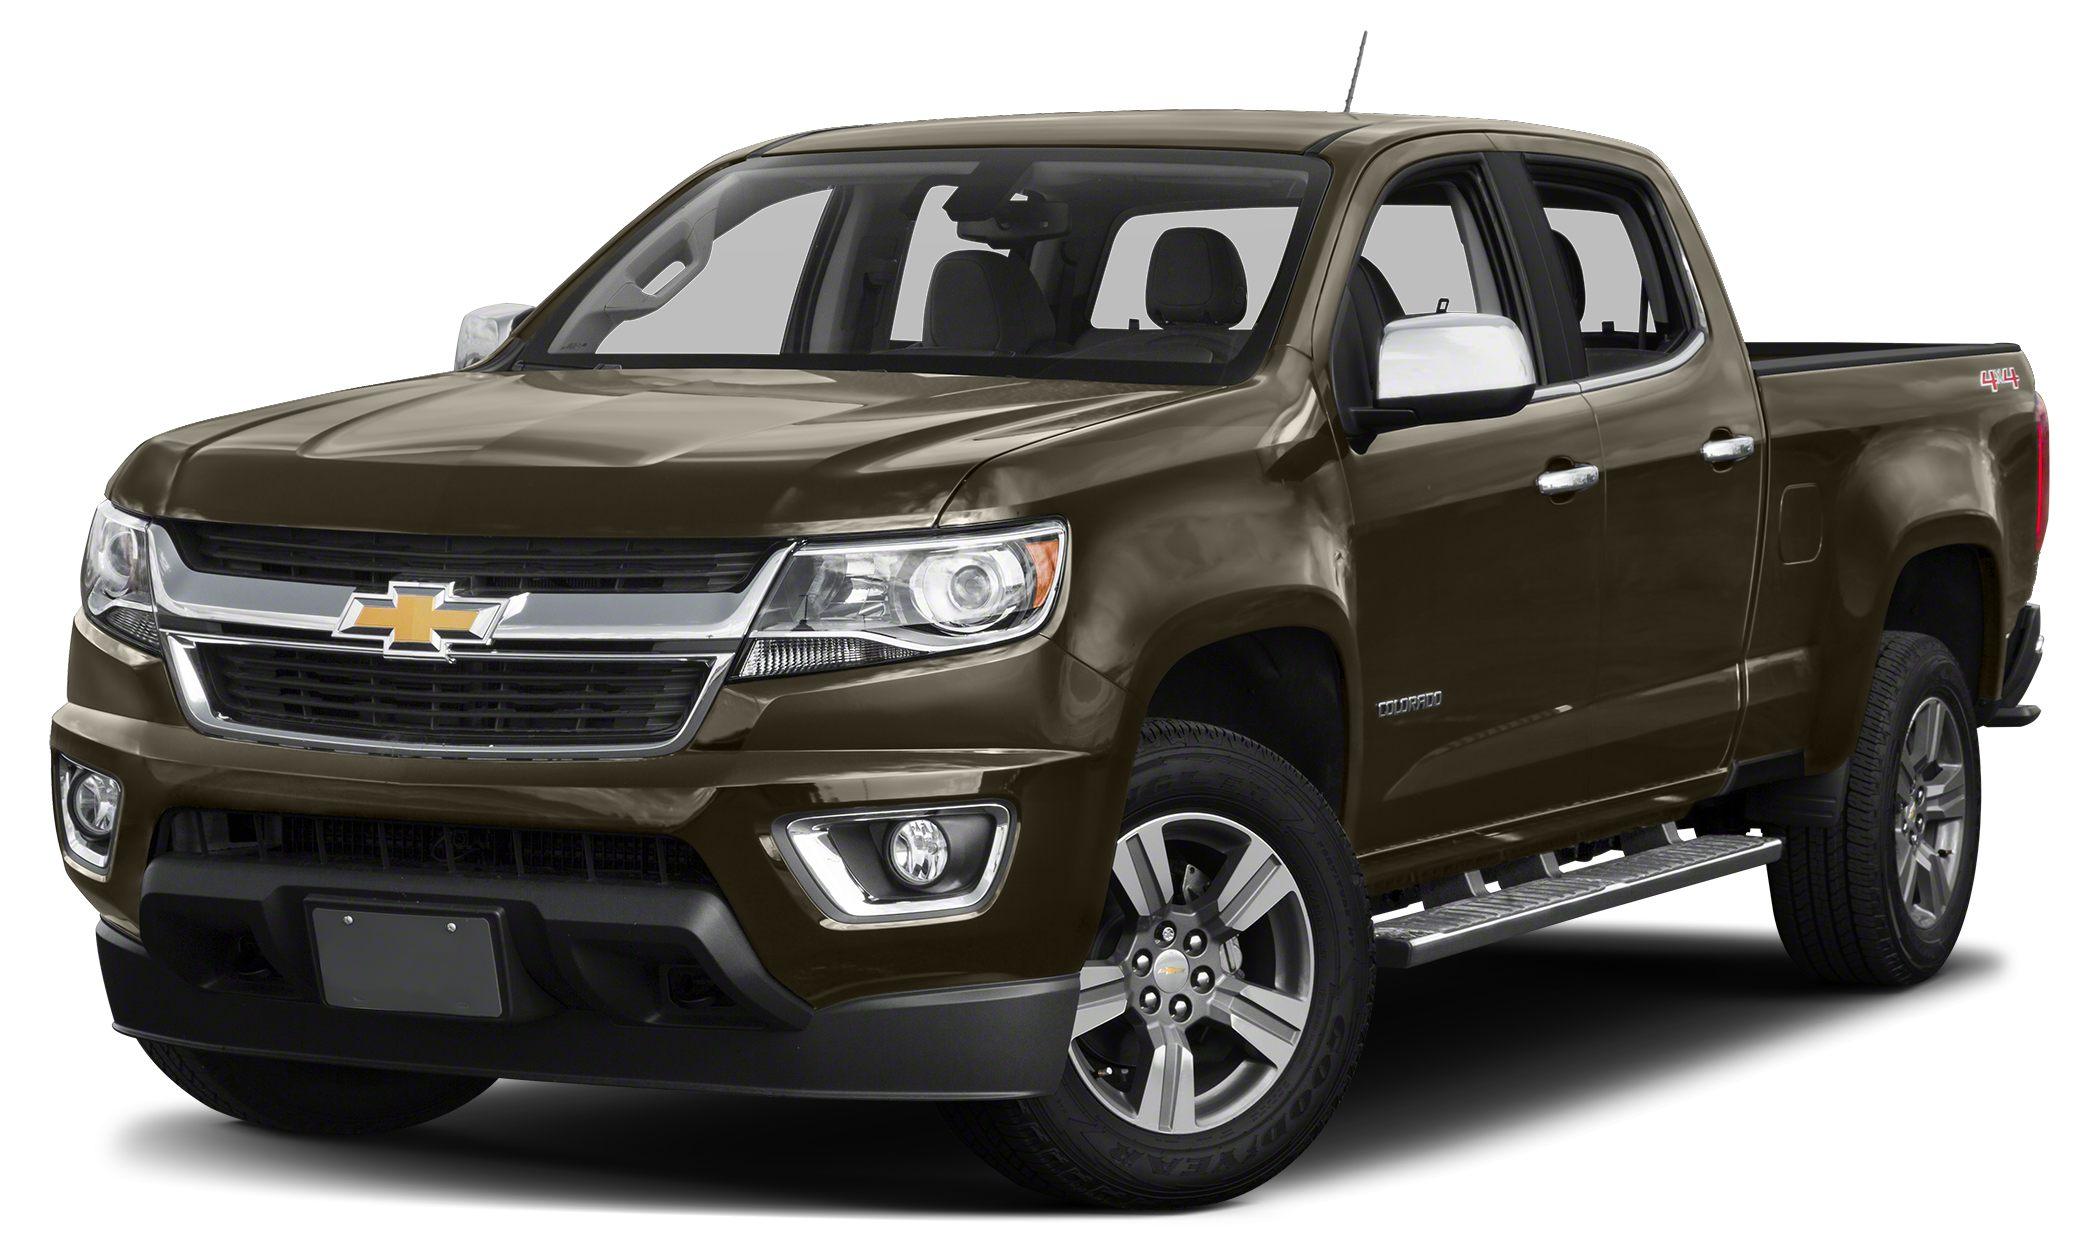 2018 Chevrolet Colorado LT Miles 1075Color Green Metallic Stock 186509 VIN 1GCGSCEN9J1154376